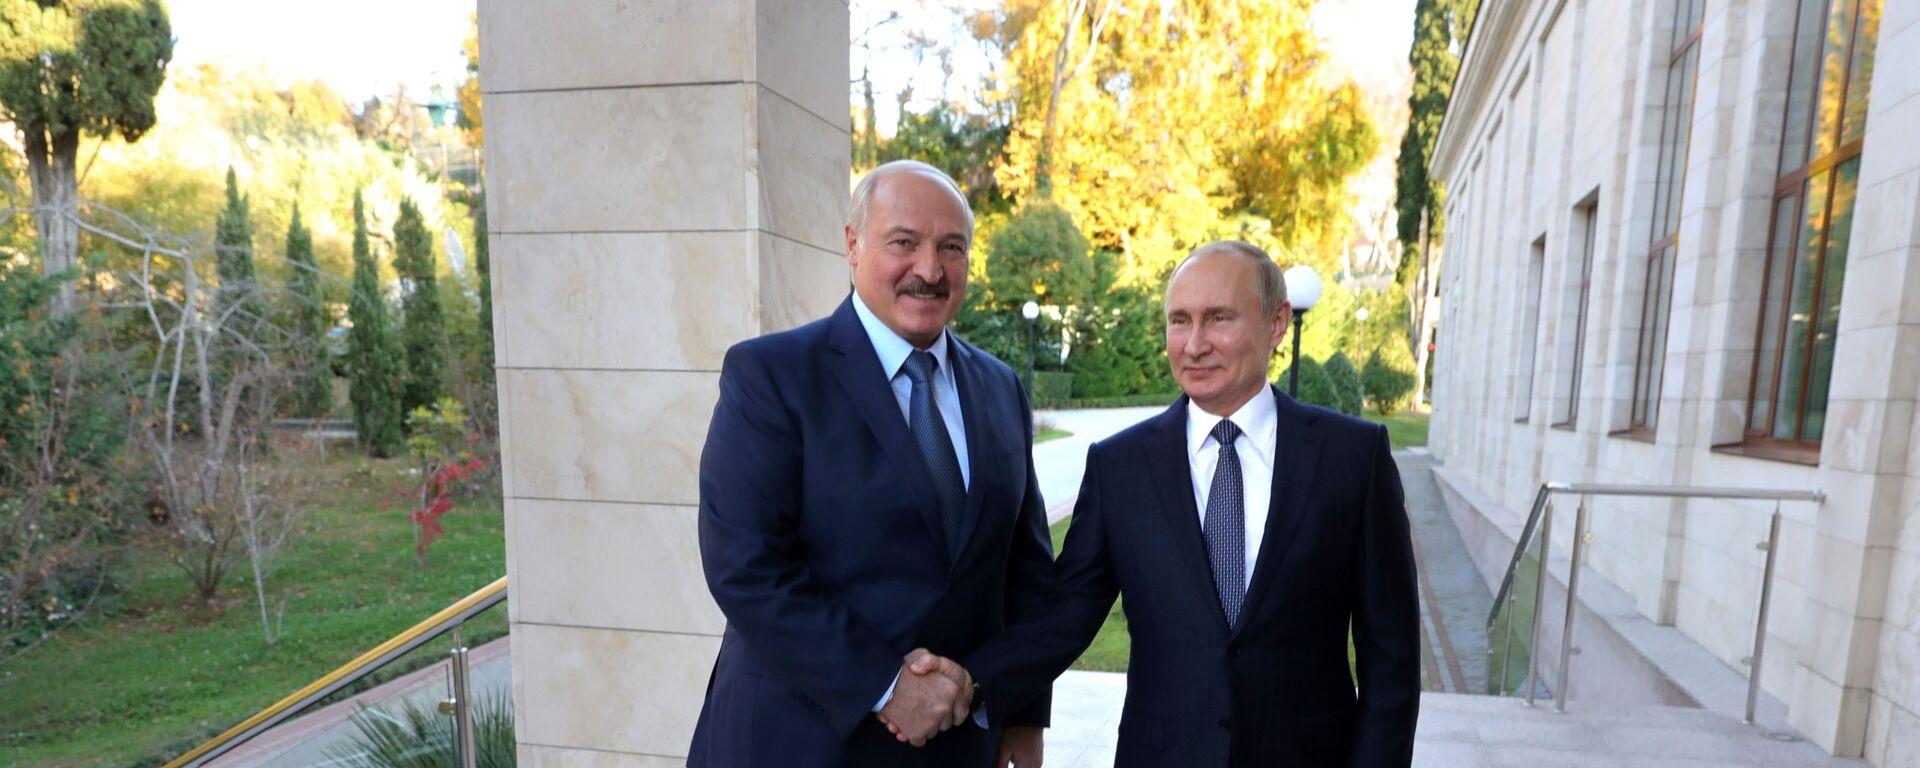 Alexandr Lukašenko a Vladimir Putin - Sputnik Česká republika, 1920, 28.05.2021